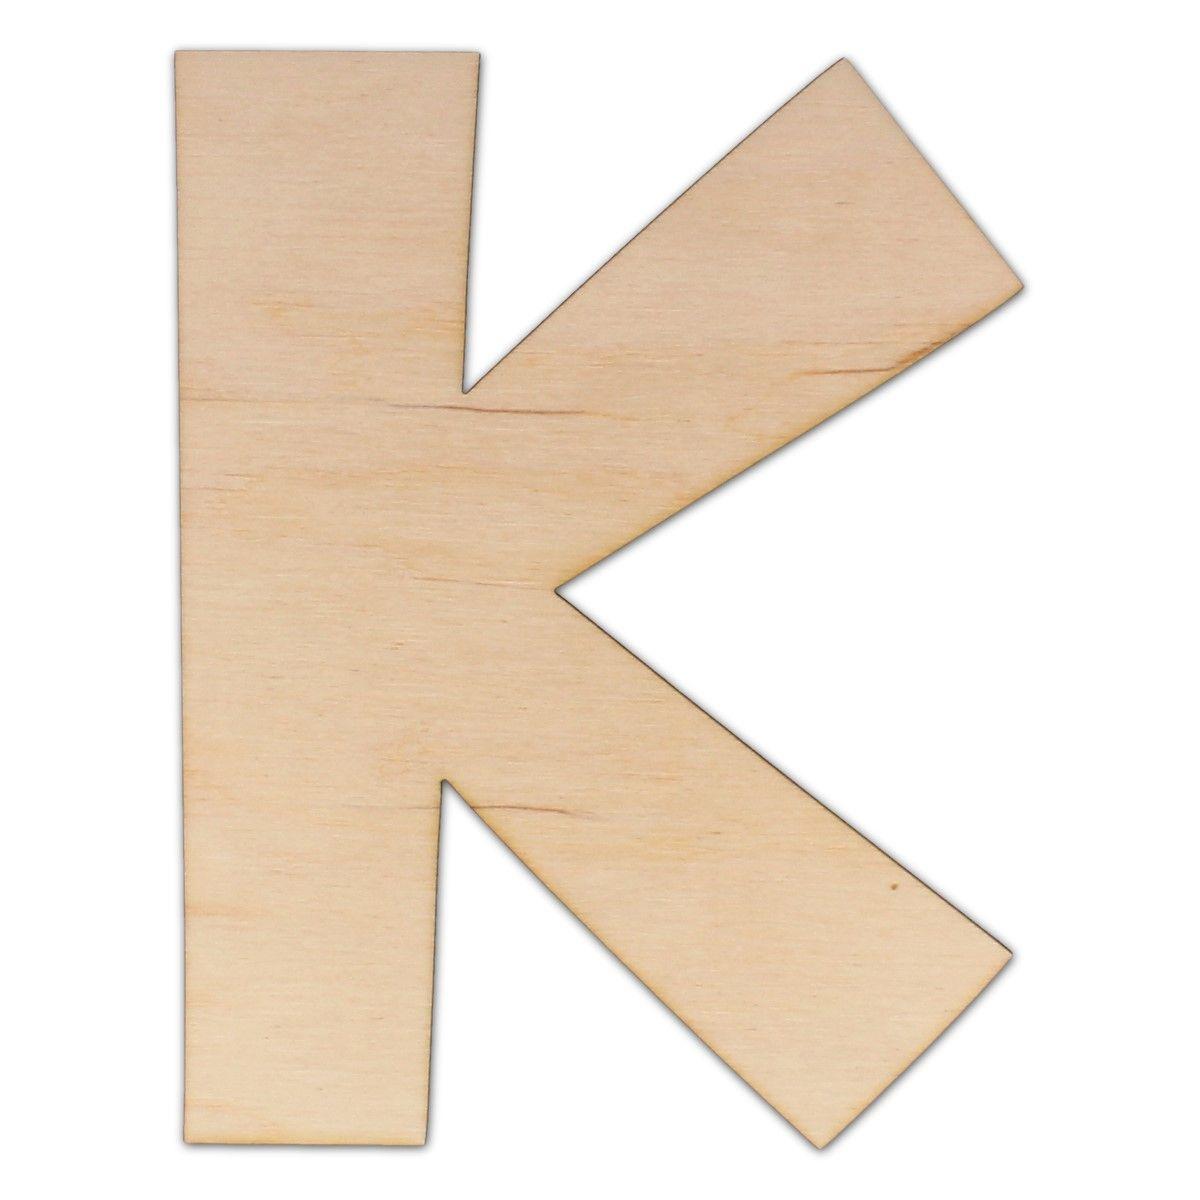 Litera K 145 Cm Ld K 6839432349 Oficjalne Archiwum Allegro